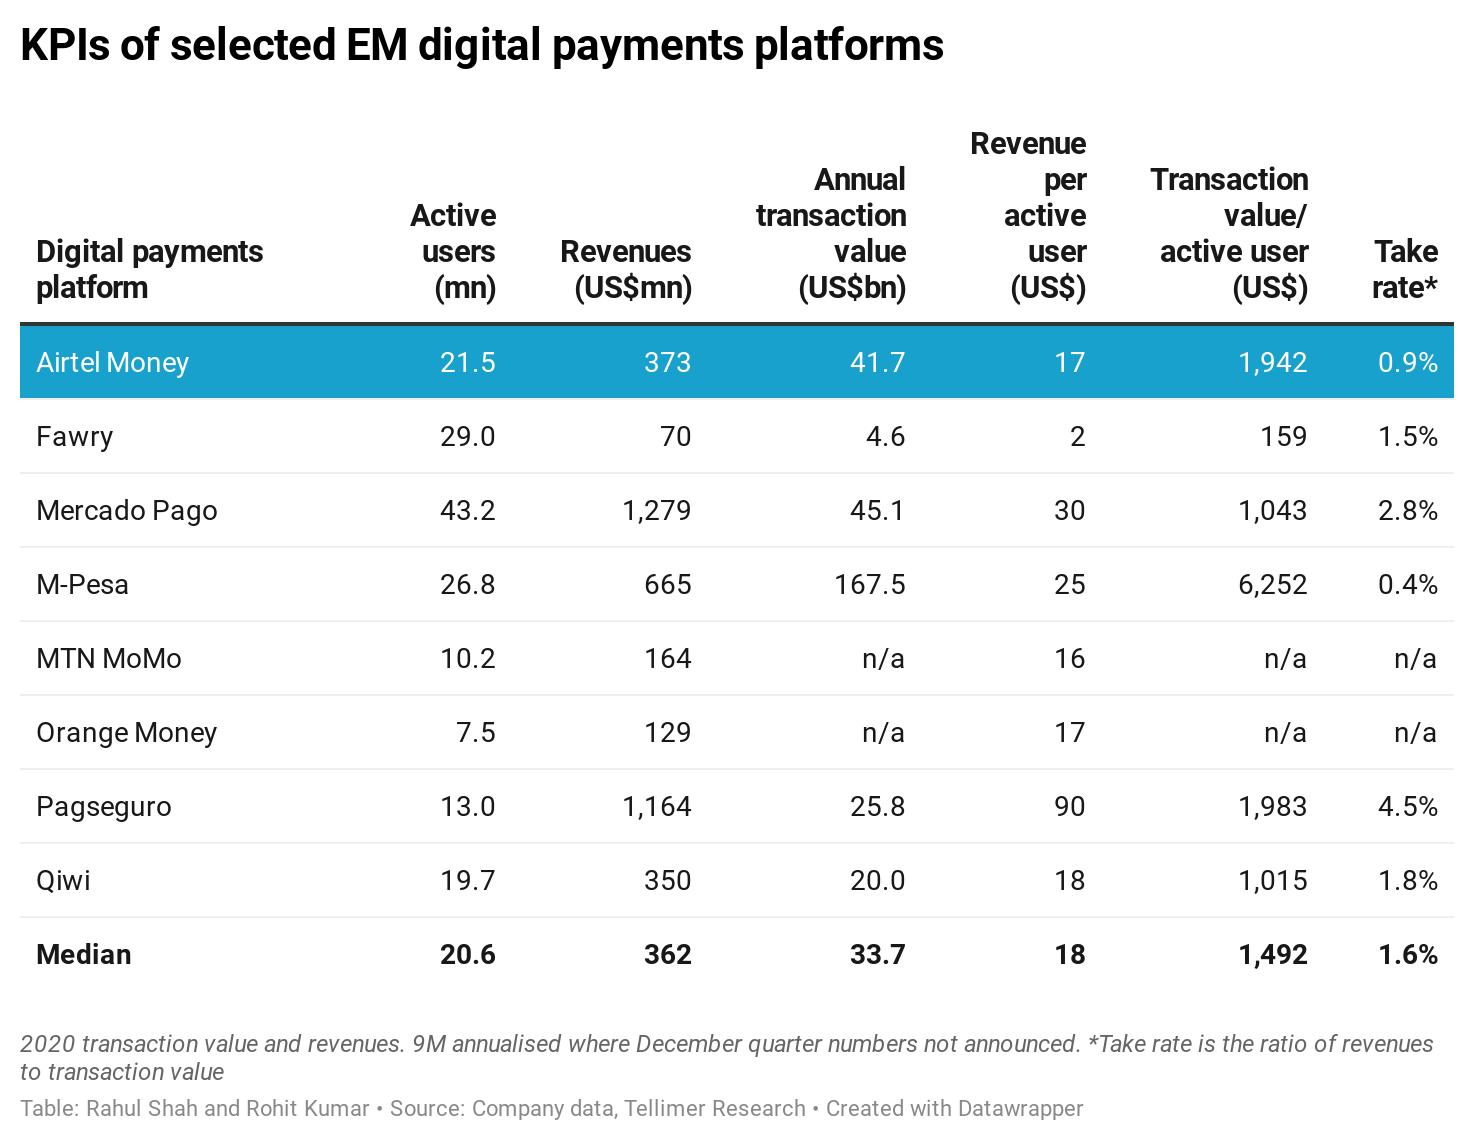 KPIs of selected EM digital payments platforms